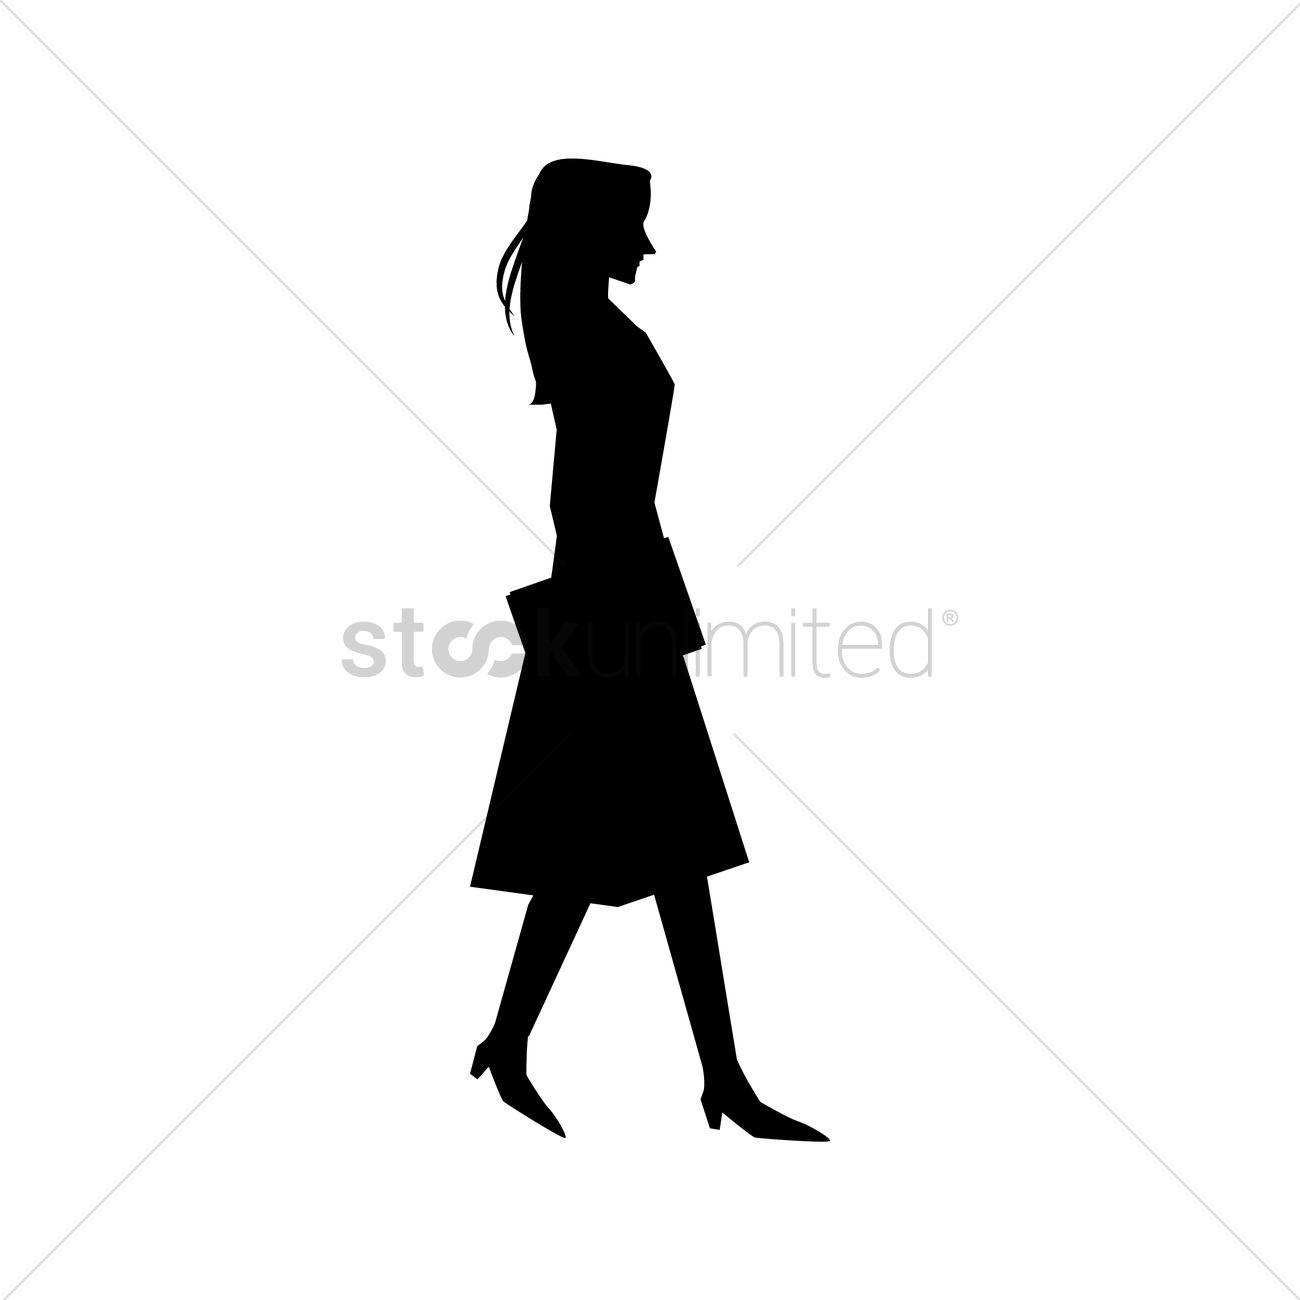 1300x1300 Woman Silhouette Design Vector Image